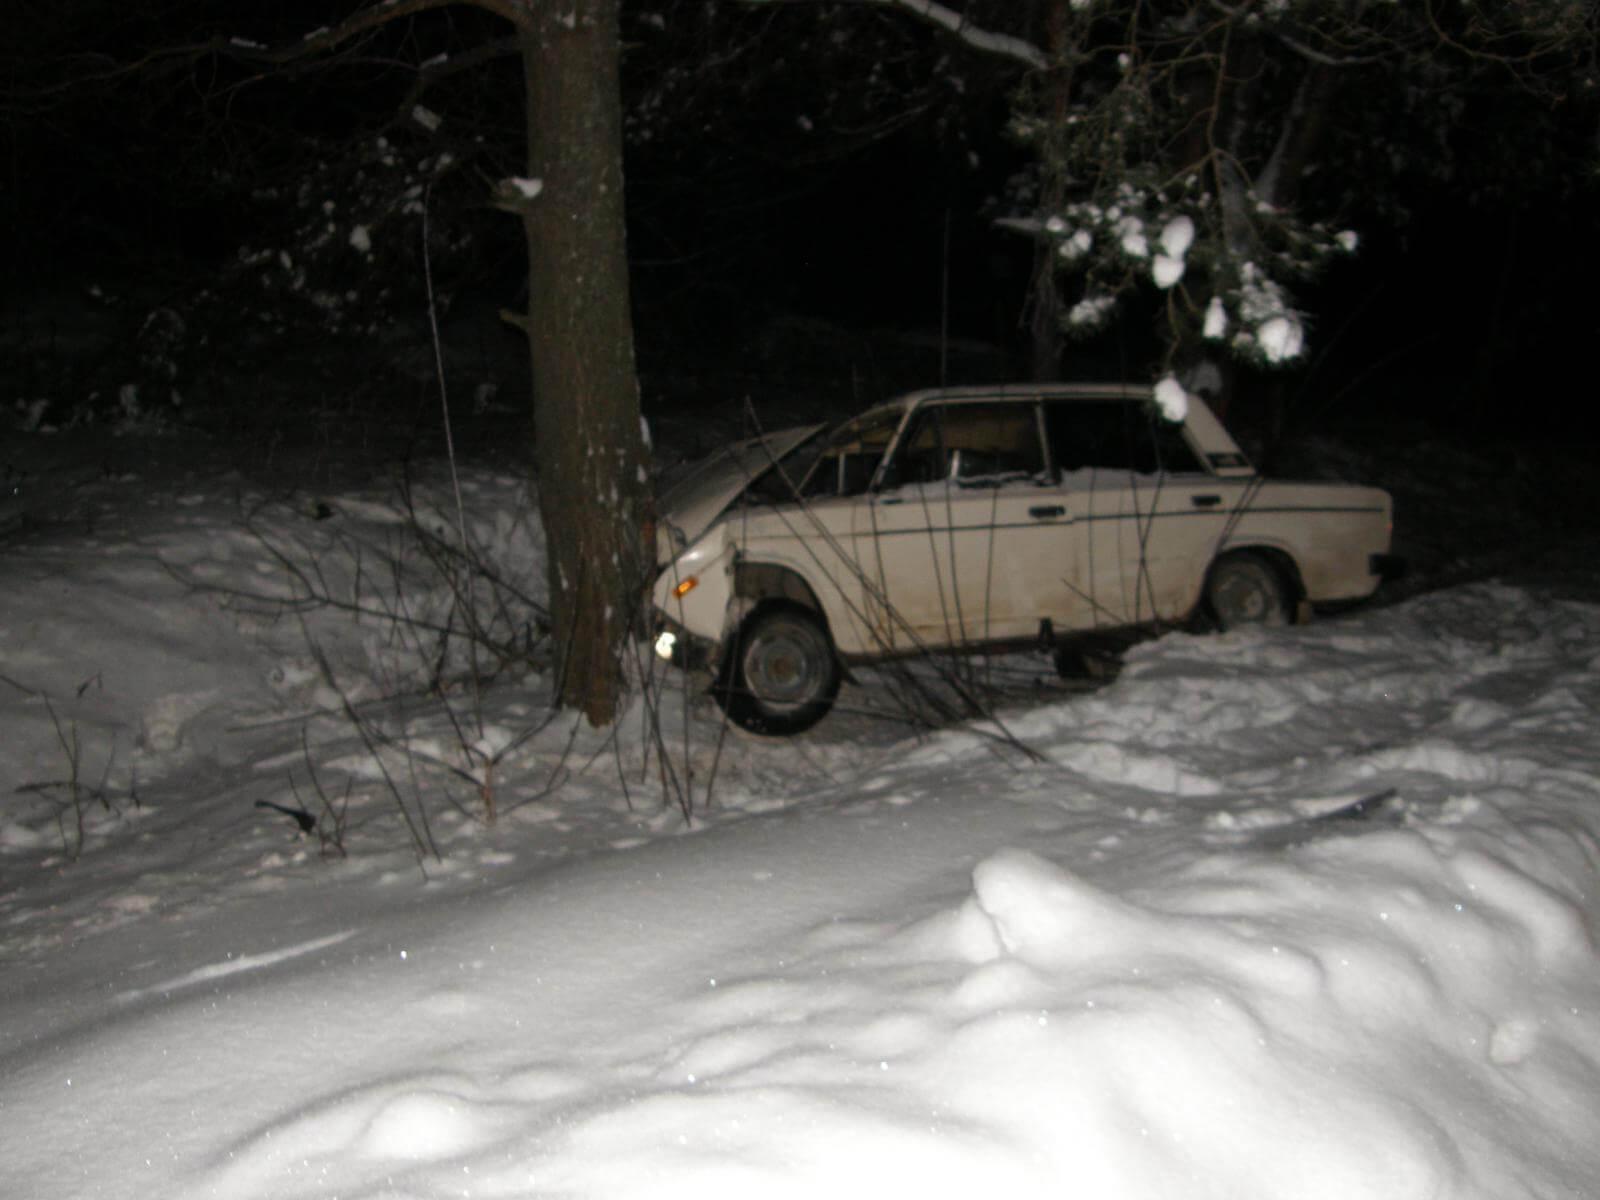 26 января на территории области в 2 ДТП пострадали 4 человека